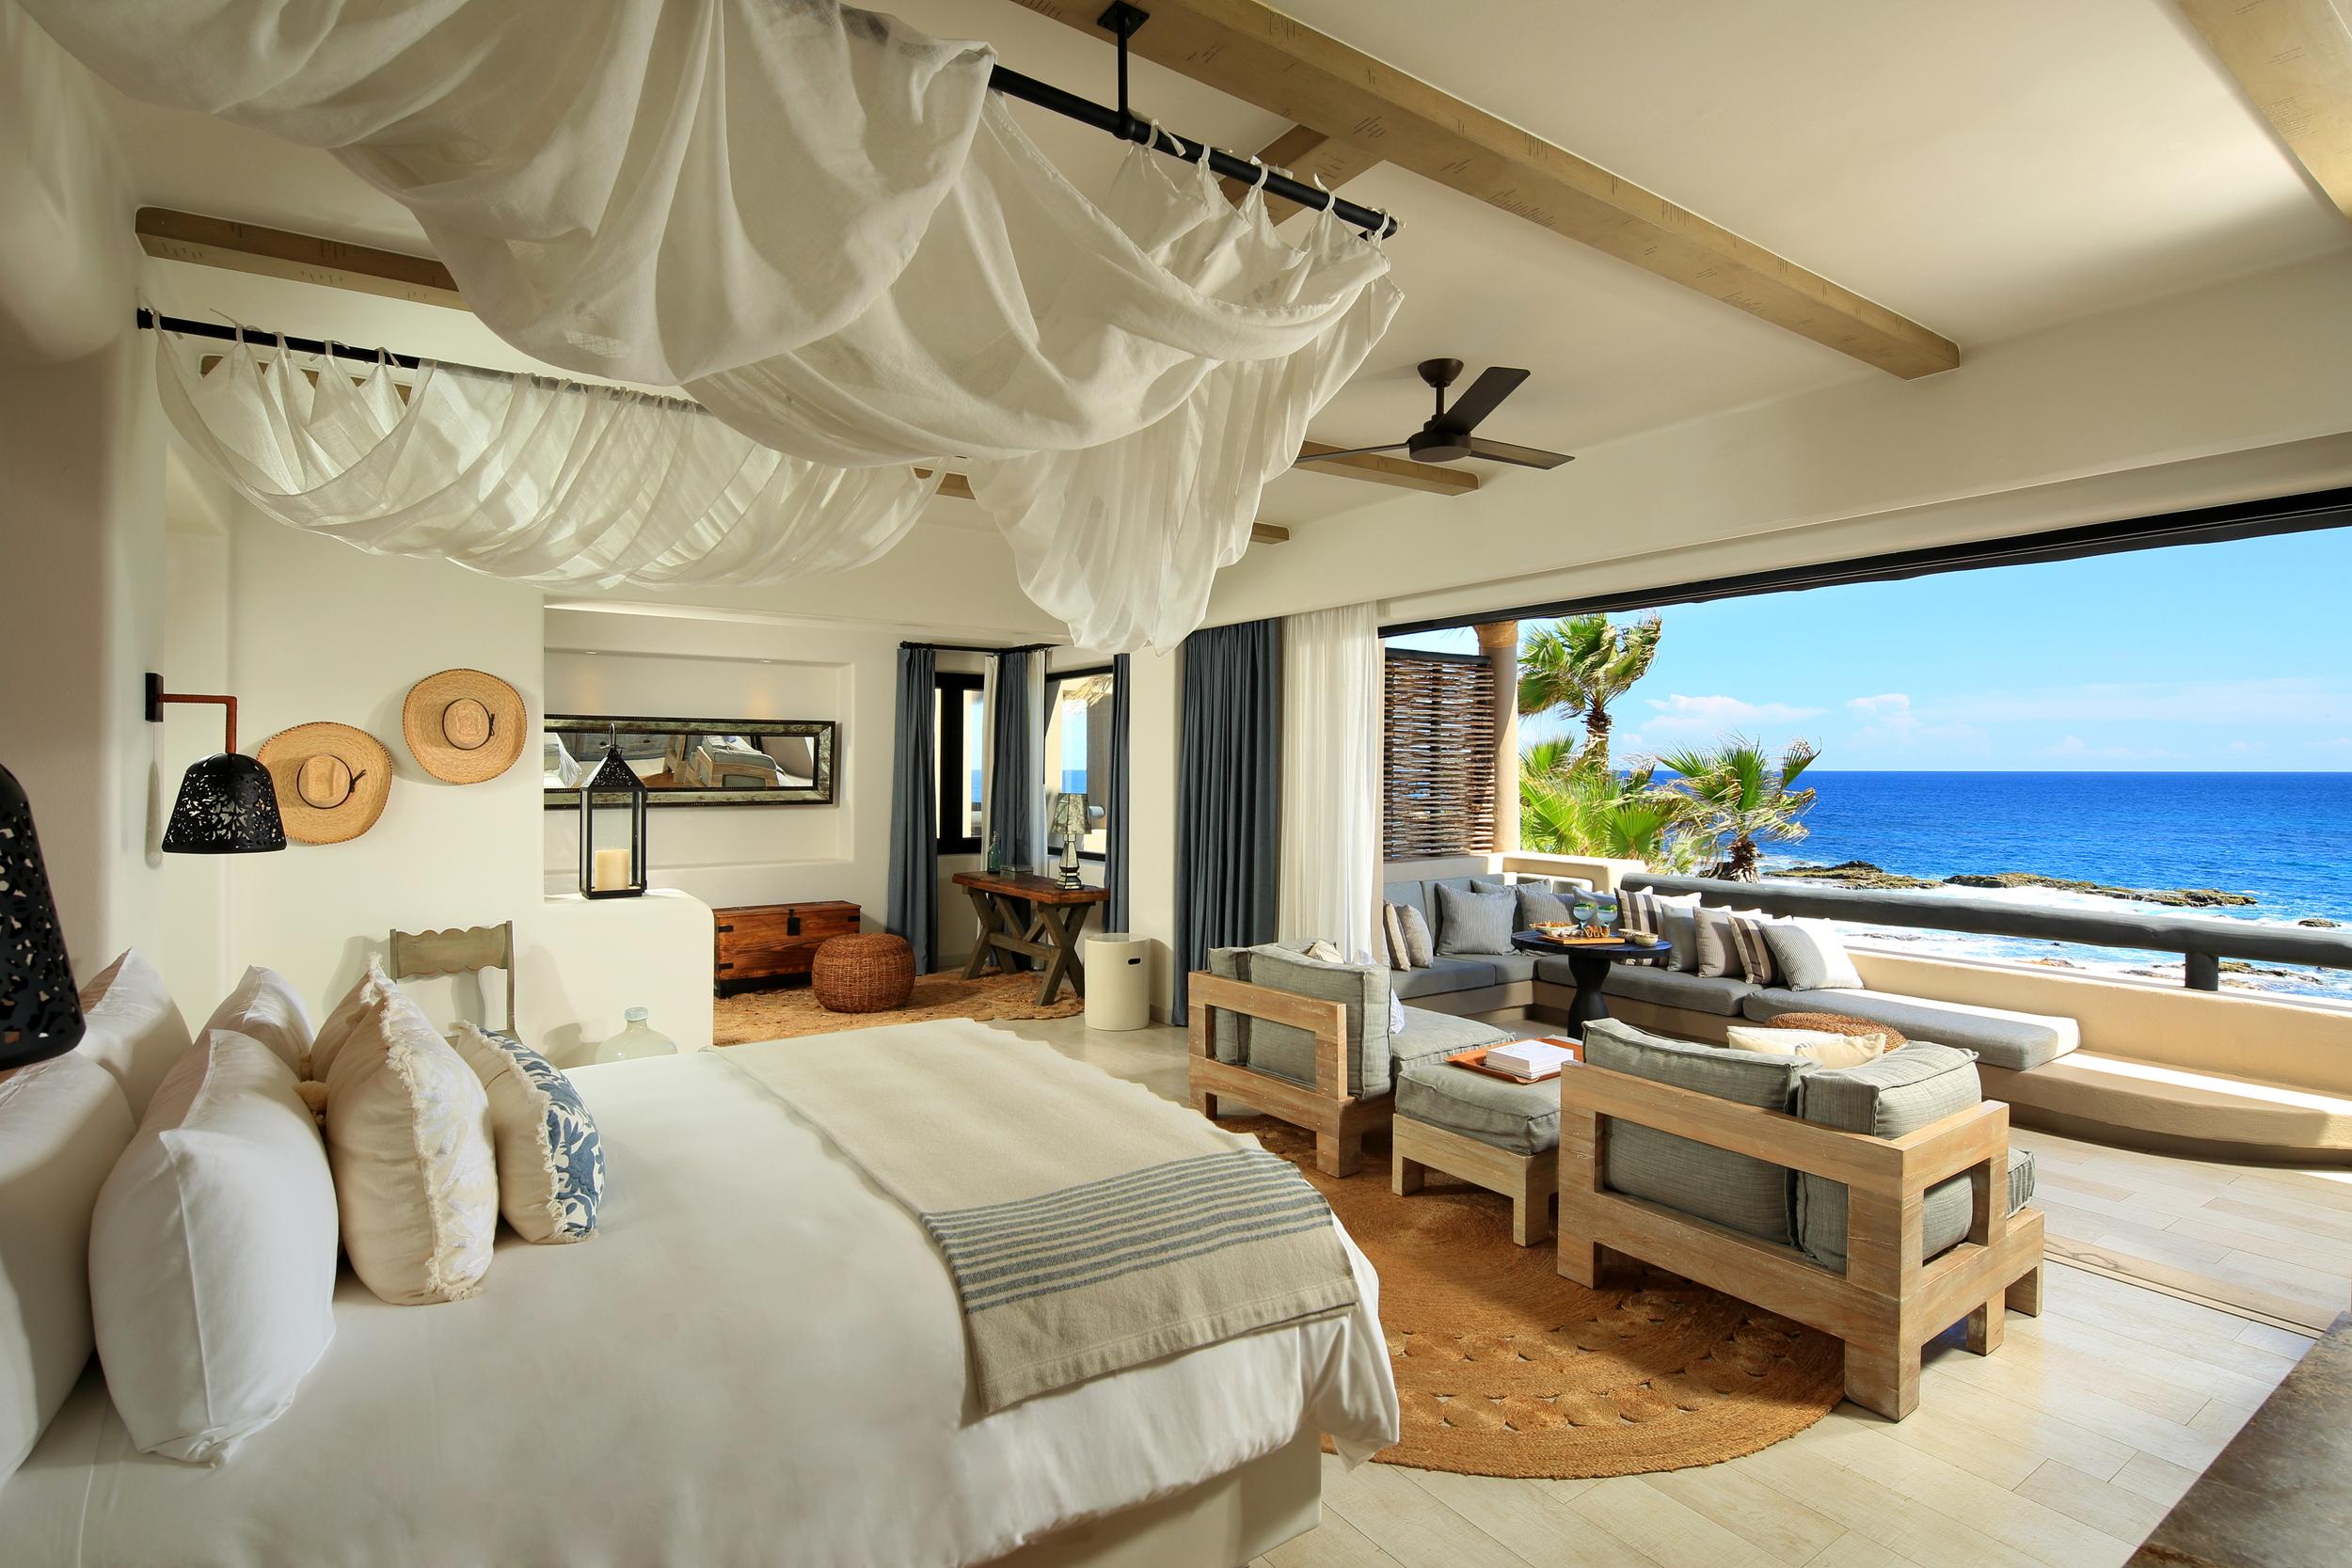 Esperanza Resort Hotel, Los Cabos, Baja California. © Erhard Pfeiffer 2016